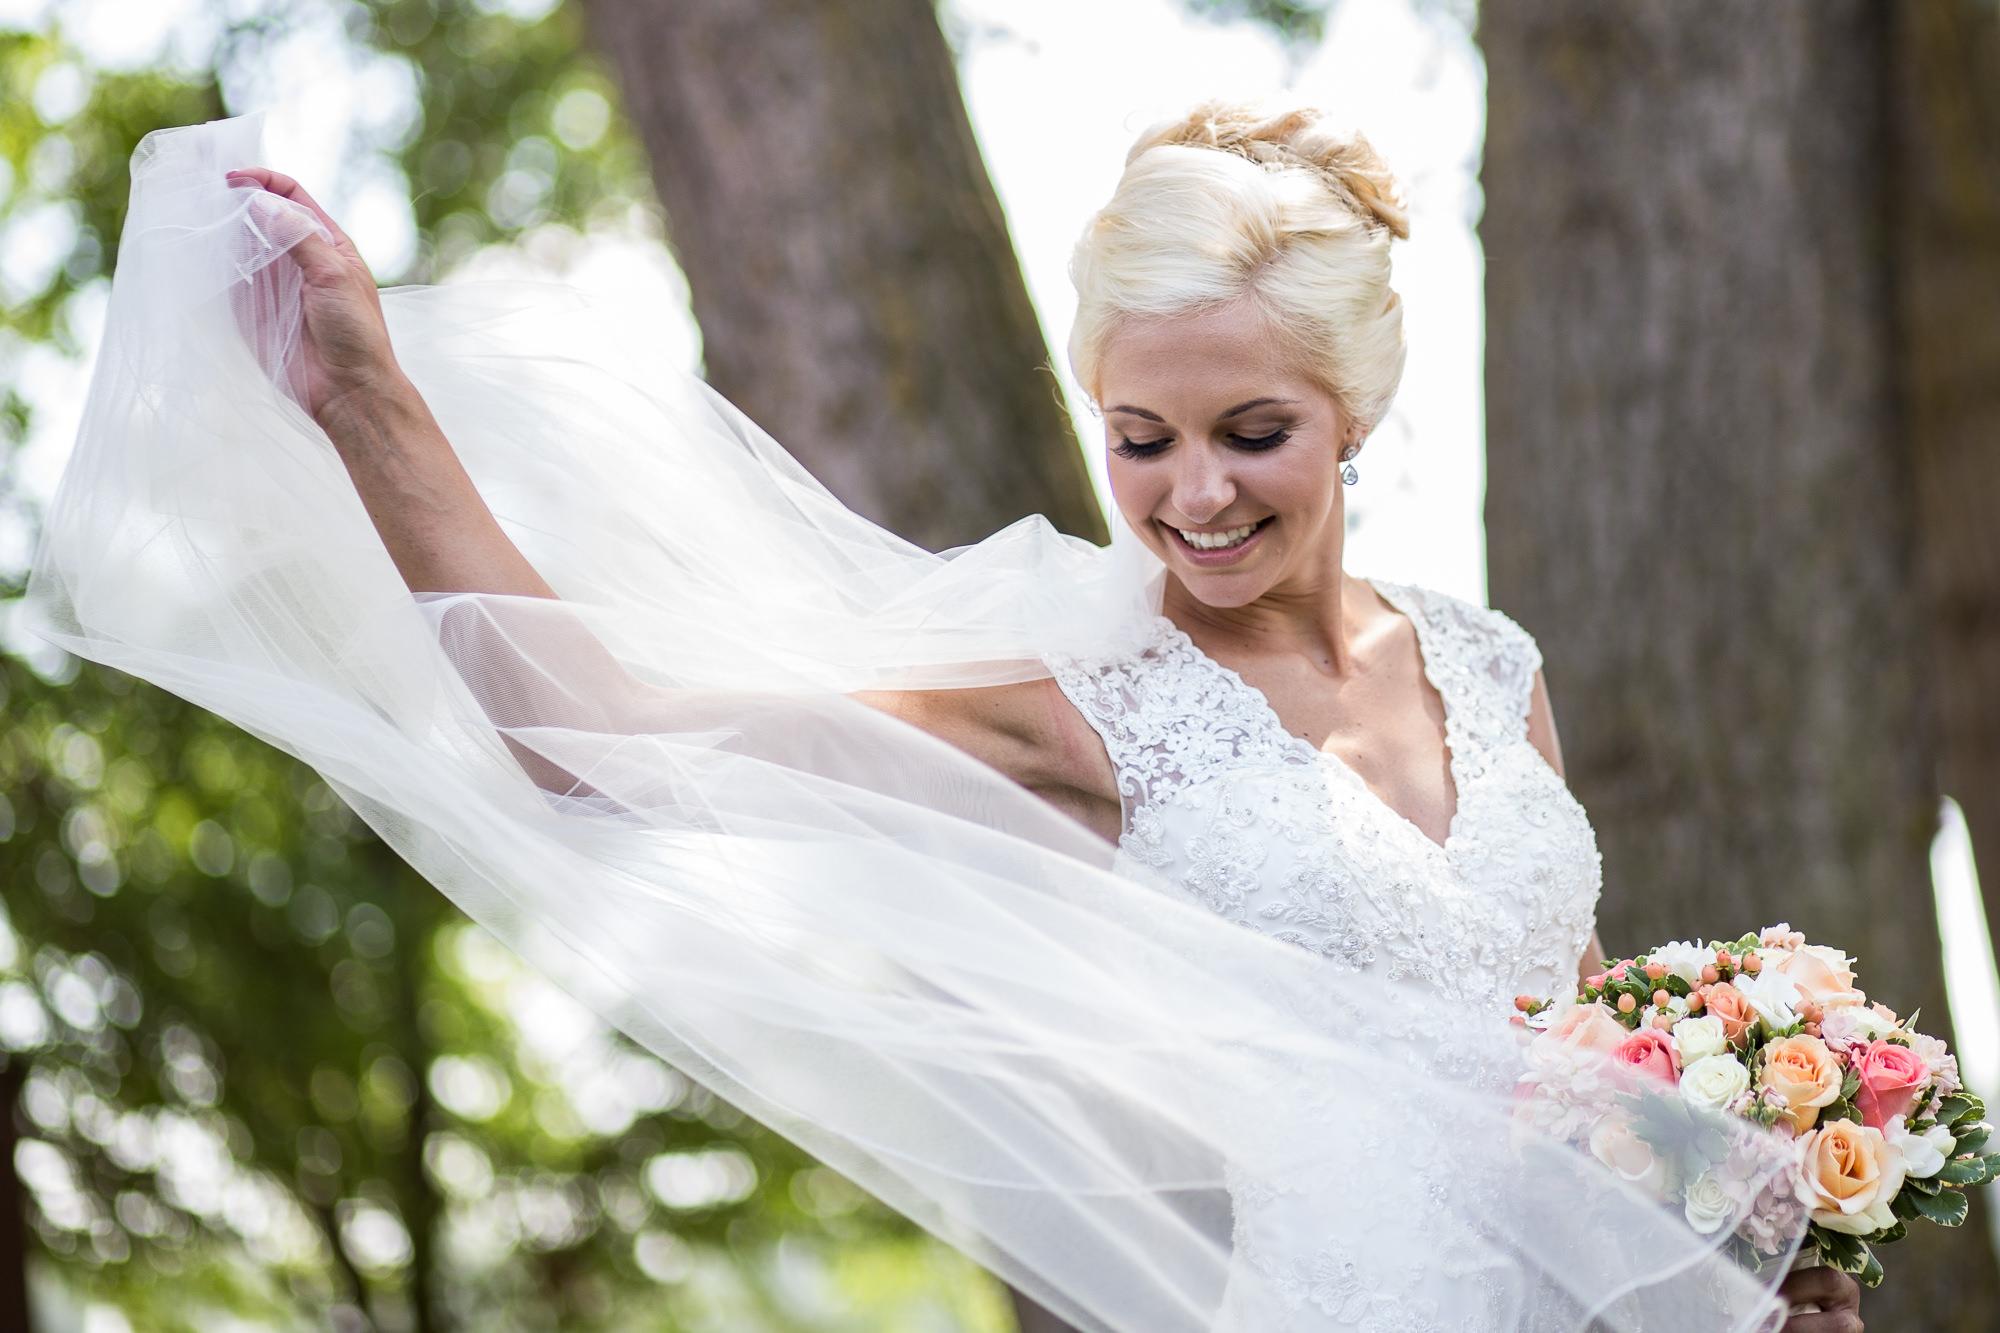 DAKOTA-DUNES-WEDDING-SOUTH-DAKOTA-WEDDING-PHOTOGRAPHER-0009.jpg